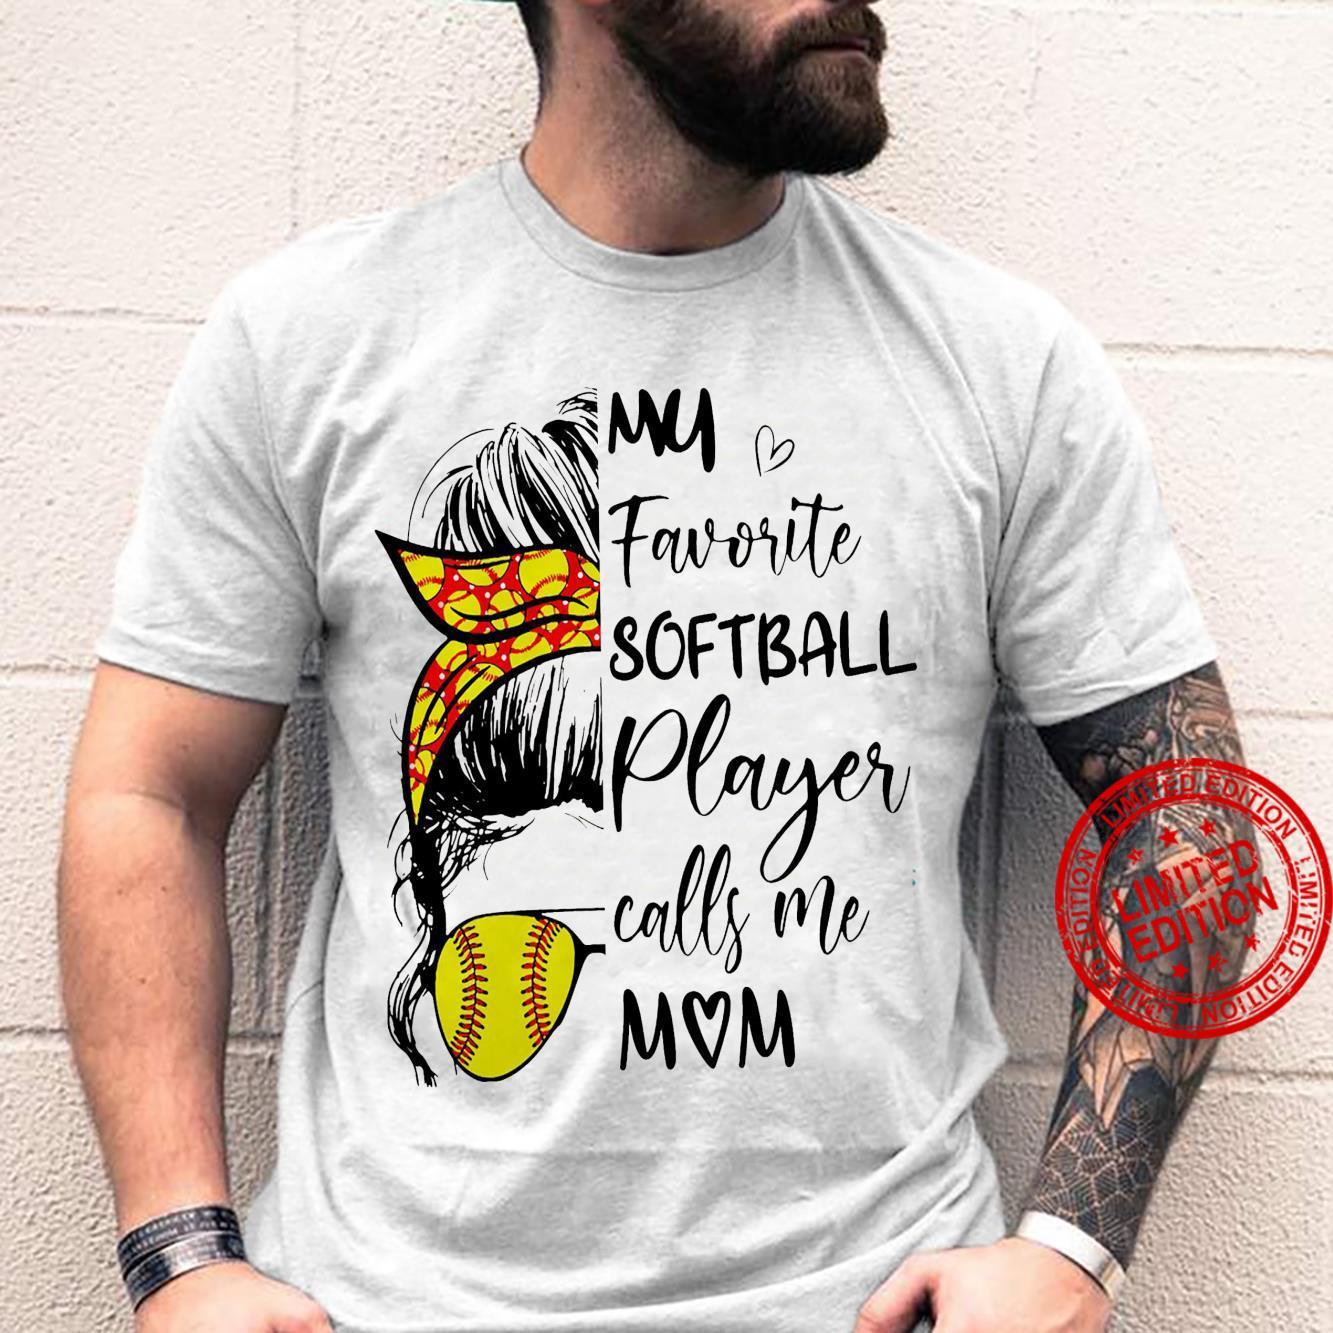 My Favorite Softball Player Calls Me Mom Shirt